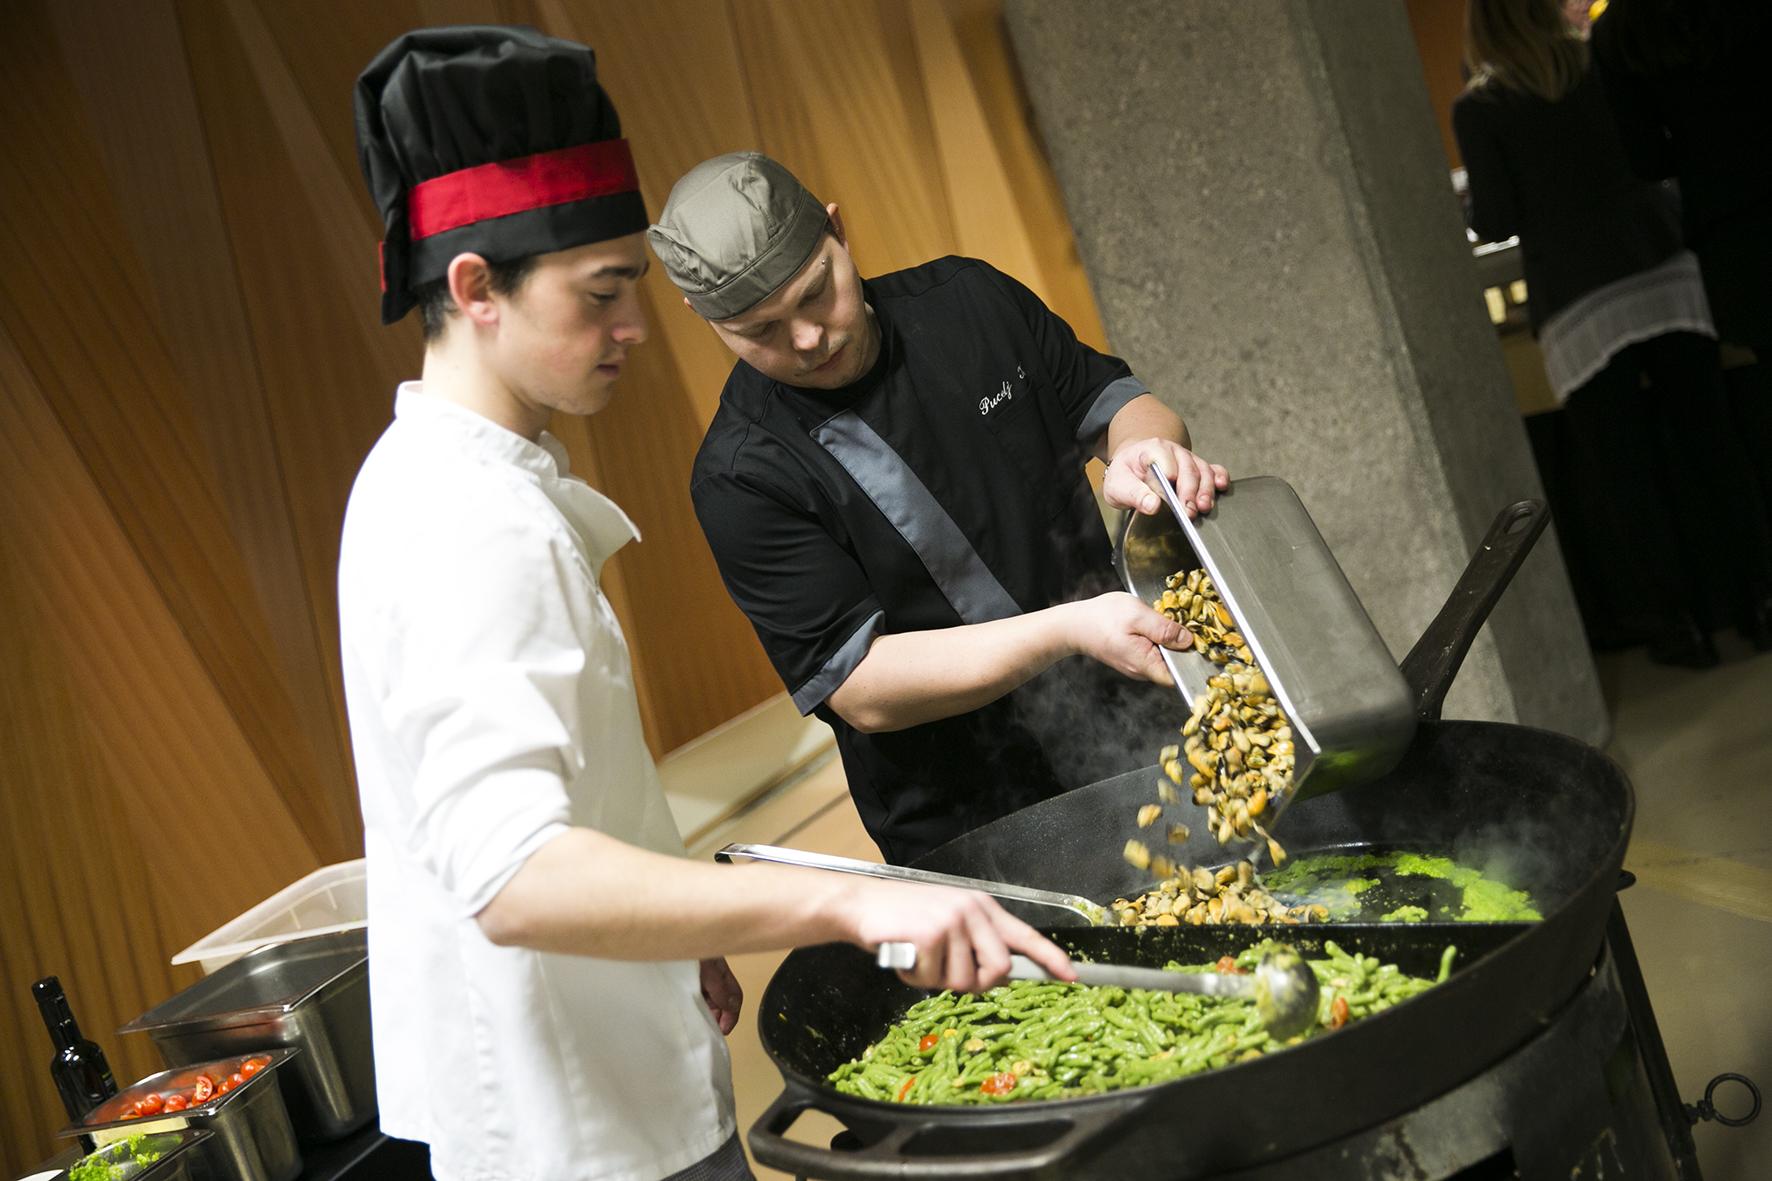 conventa-catering-food-event